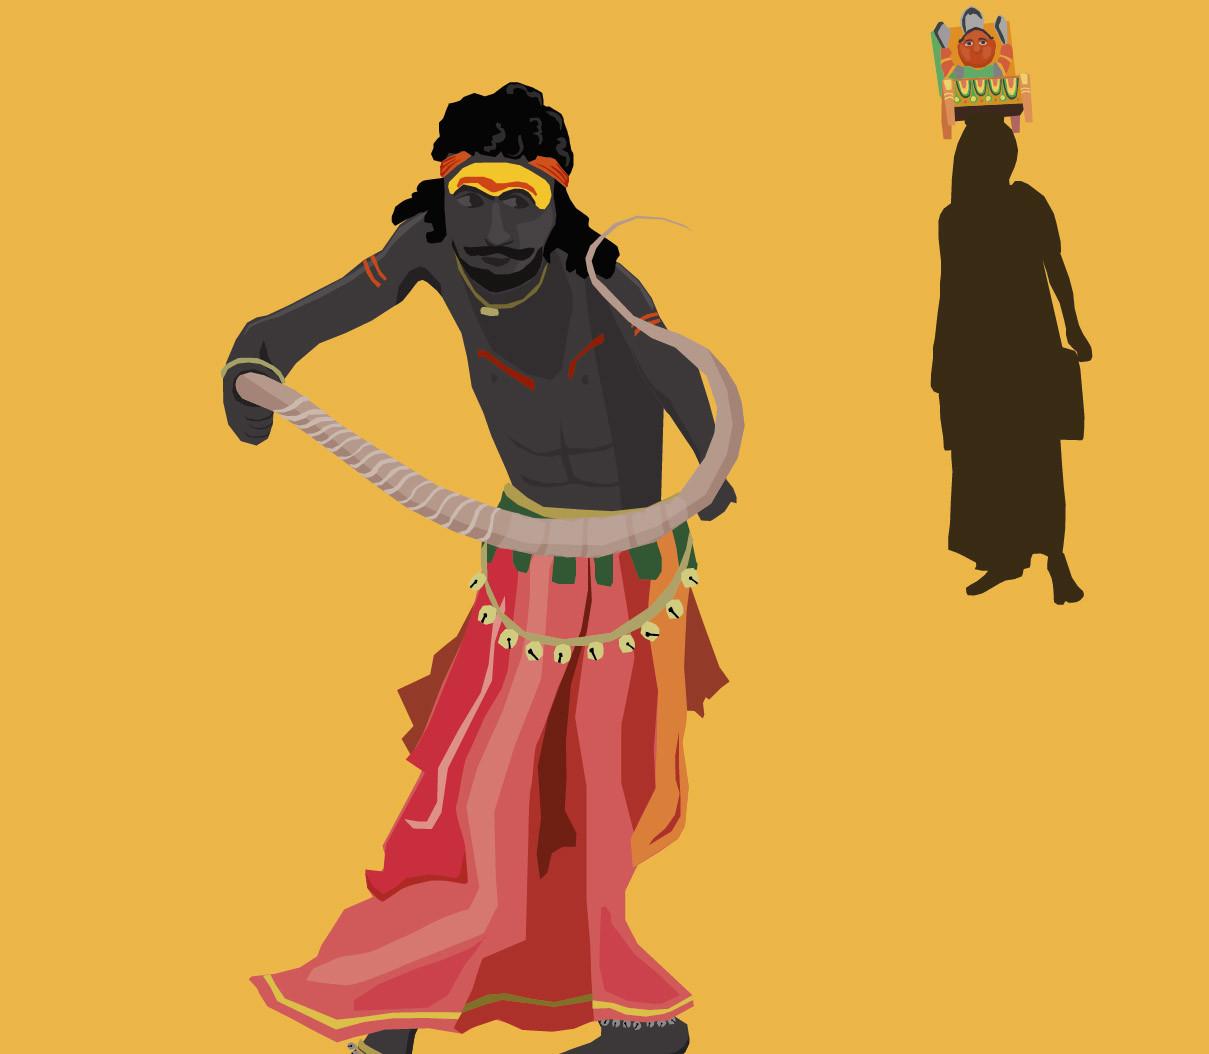 Rajesh sawant mobile god jari mari whipper closeup